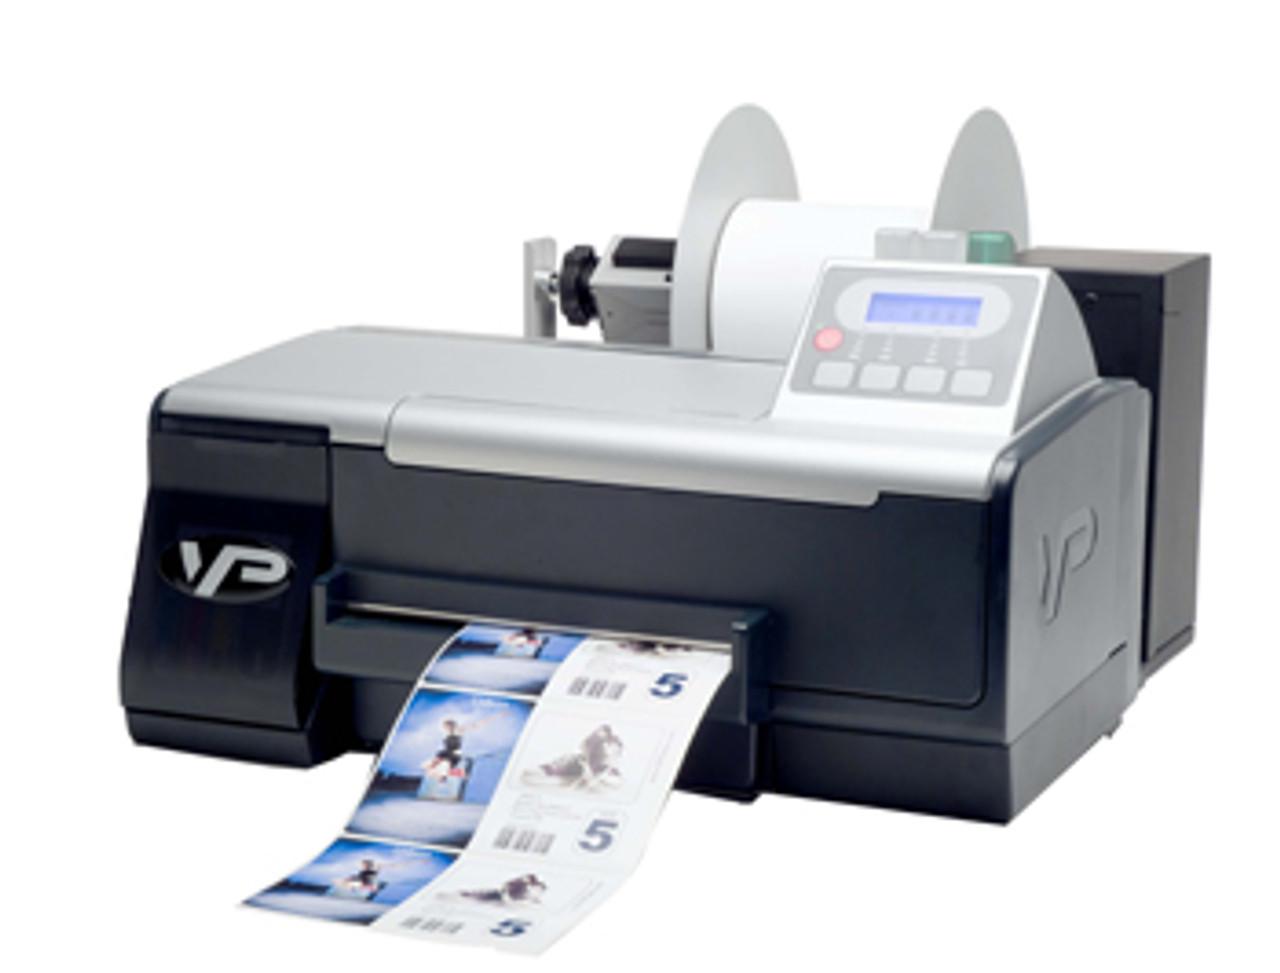 VIPColor VP485 Color Label Printer